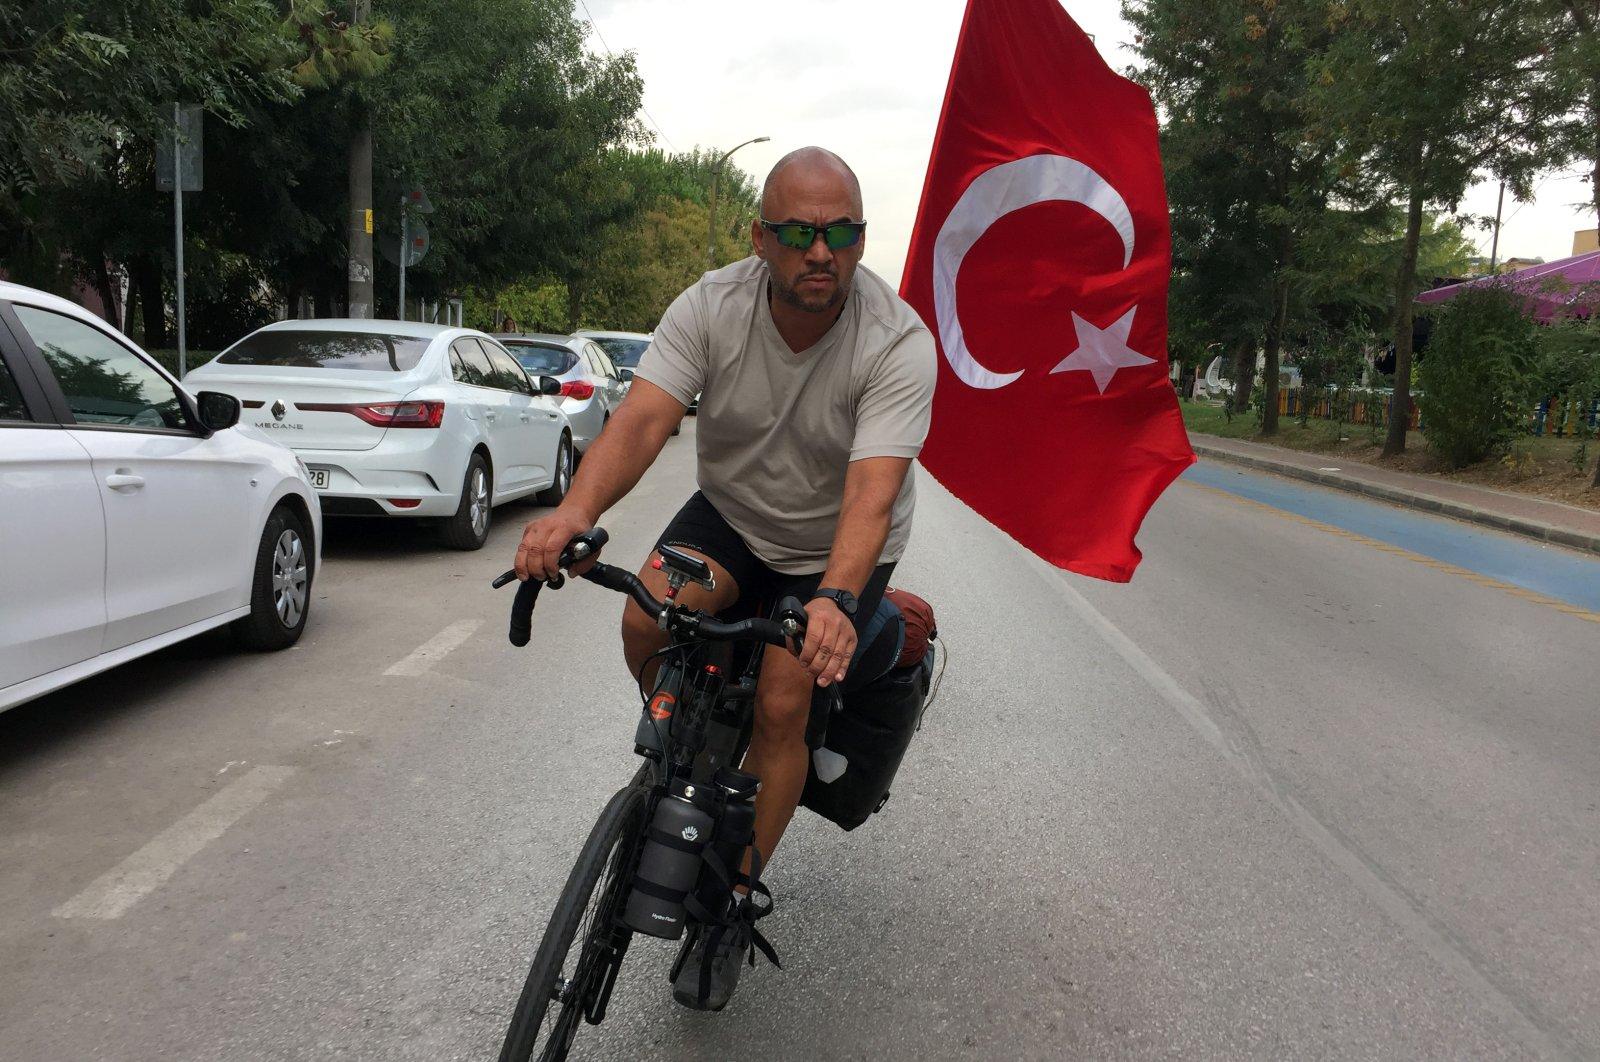 Recai Pak rides his bicycle, in Kocaeli, northwestern Turkey, Sept. 29, 2020. (AA Photo)